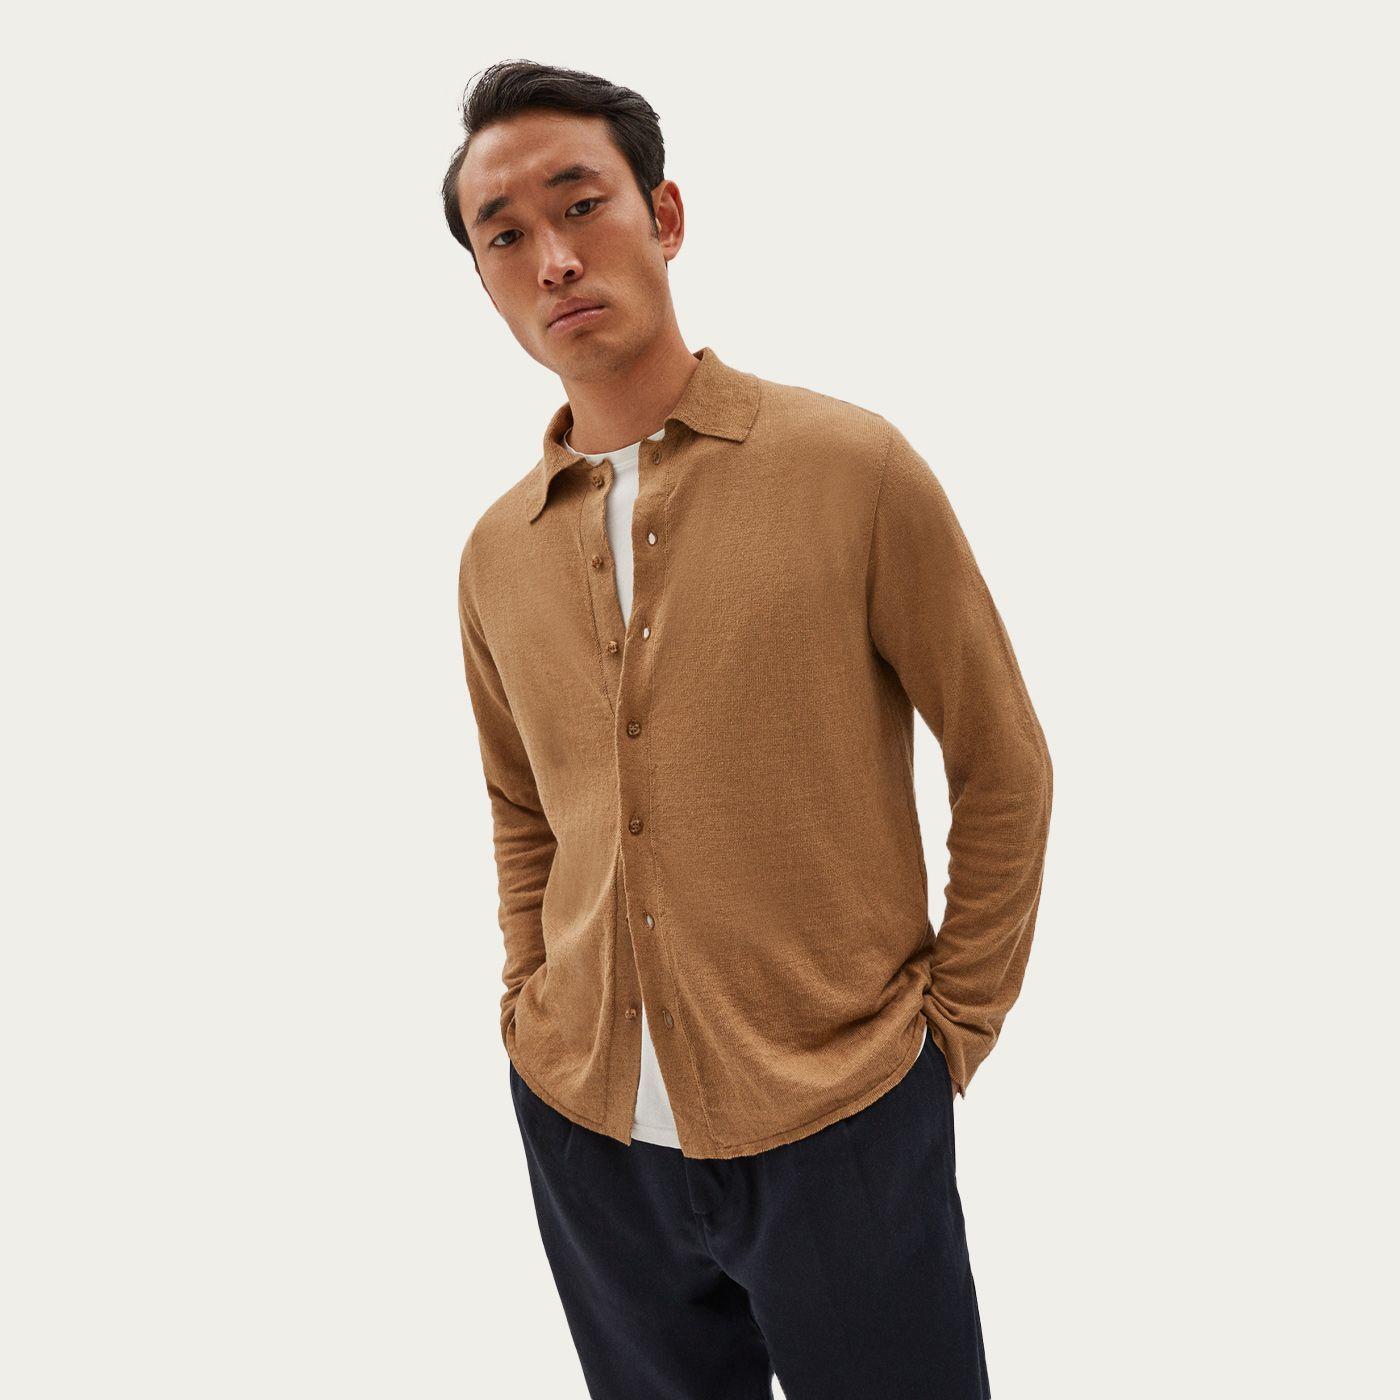 Camel Linen Knit Cardigan Shirt | Bombinate